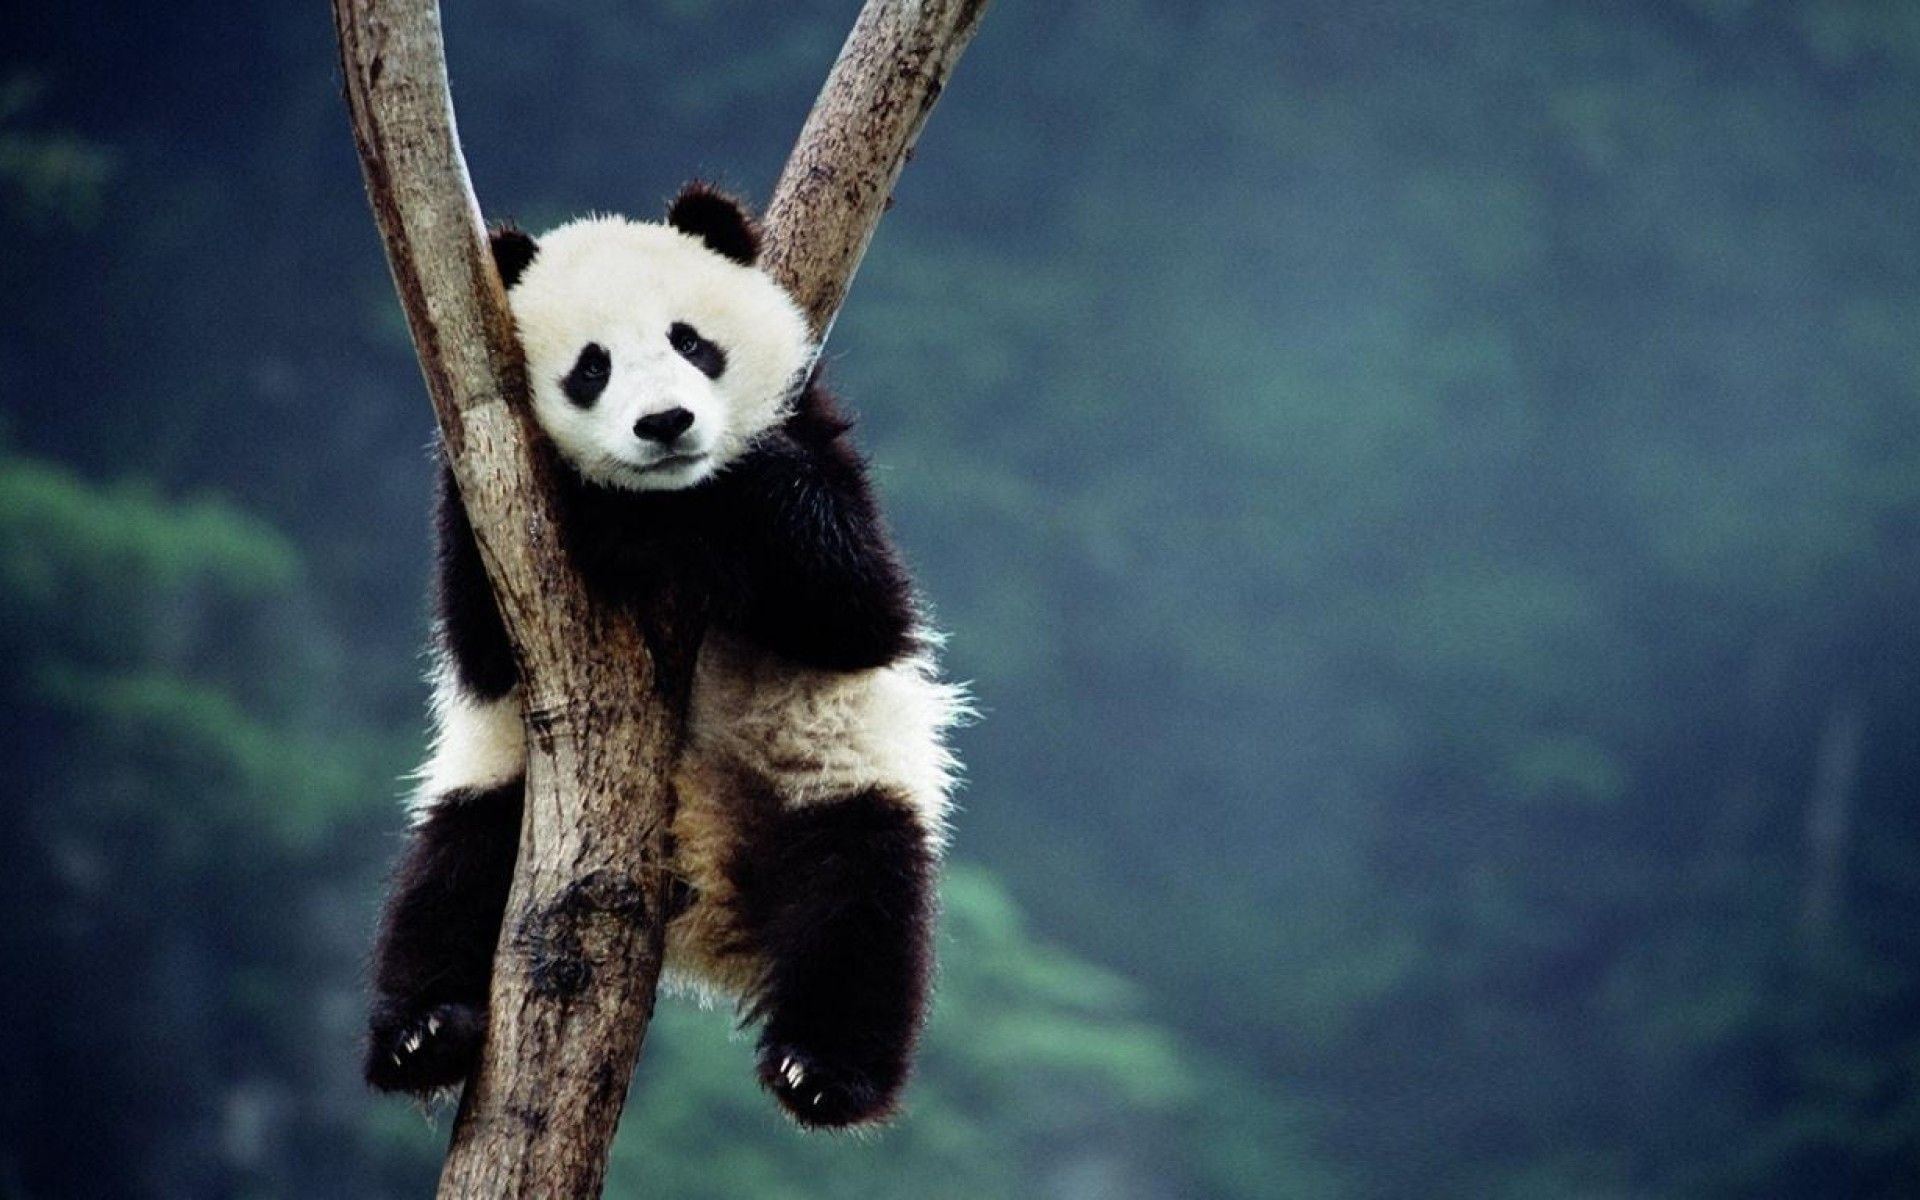 Baby Panda Hd Picture 597296910 Lawson Martinovic